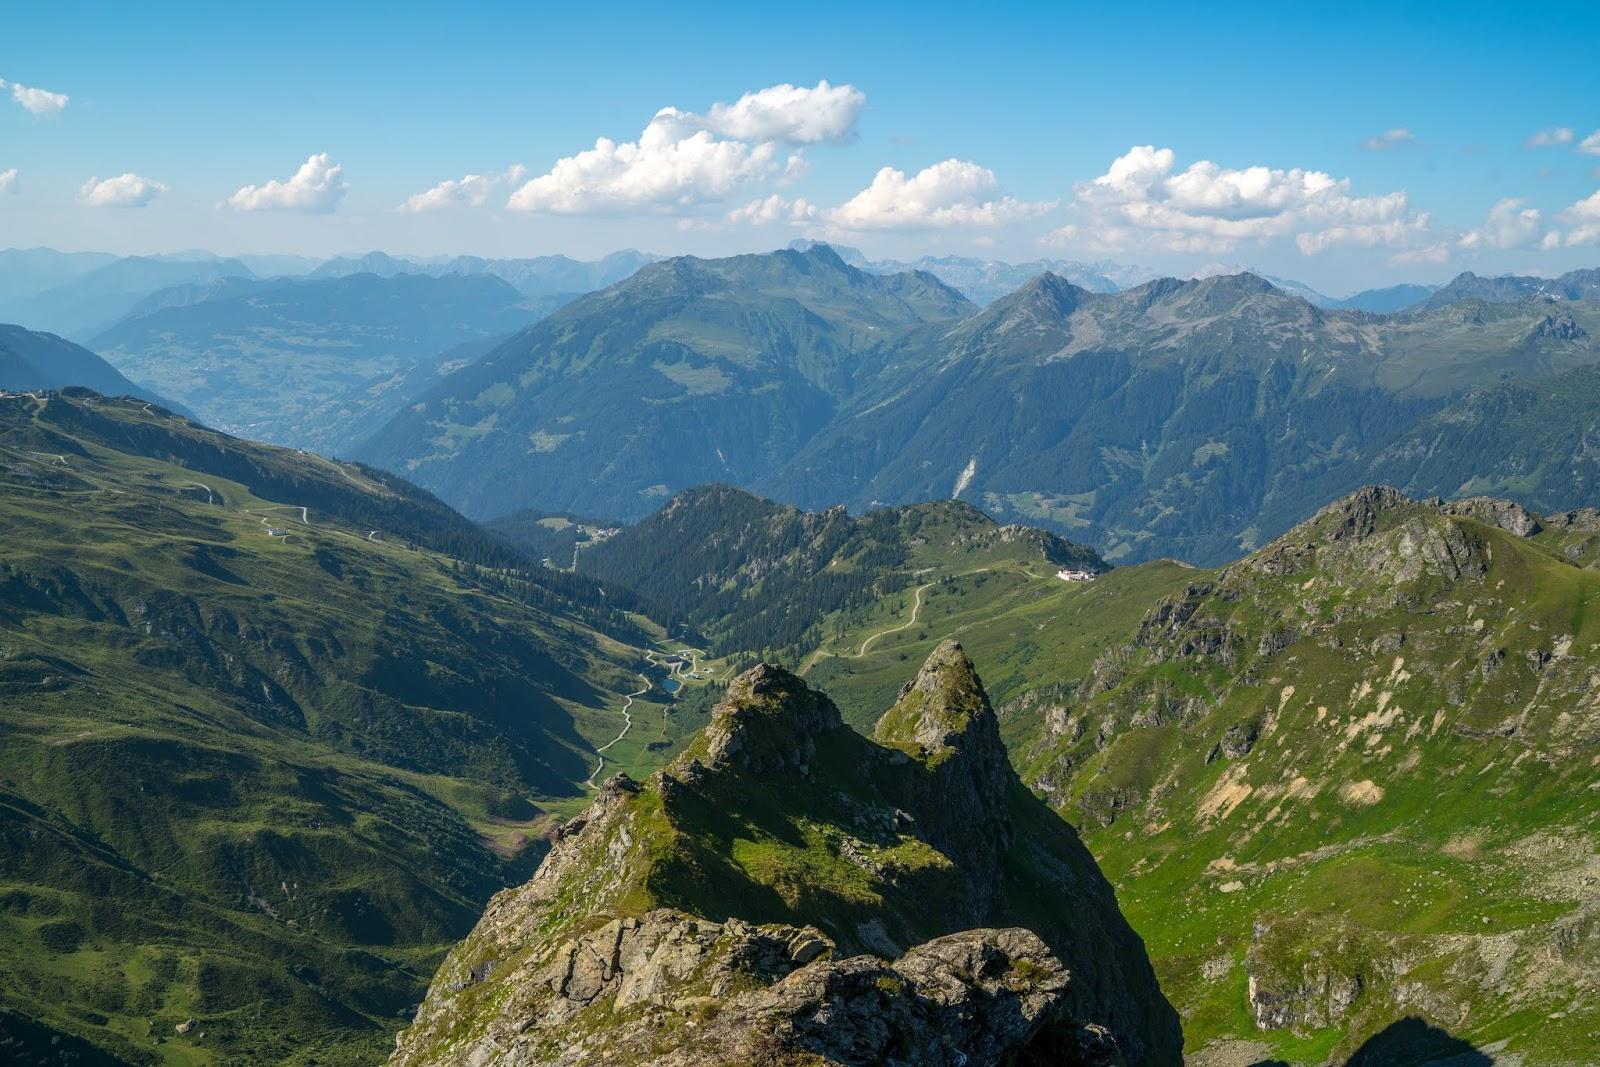 Klettersteig Madrisella : Gipfelweg madrisella wandern silvretta montafon vorarlberg